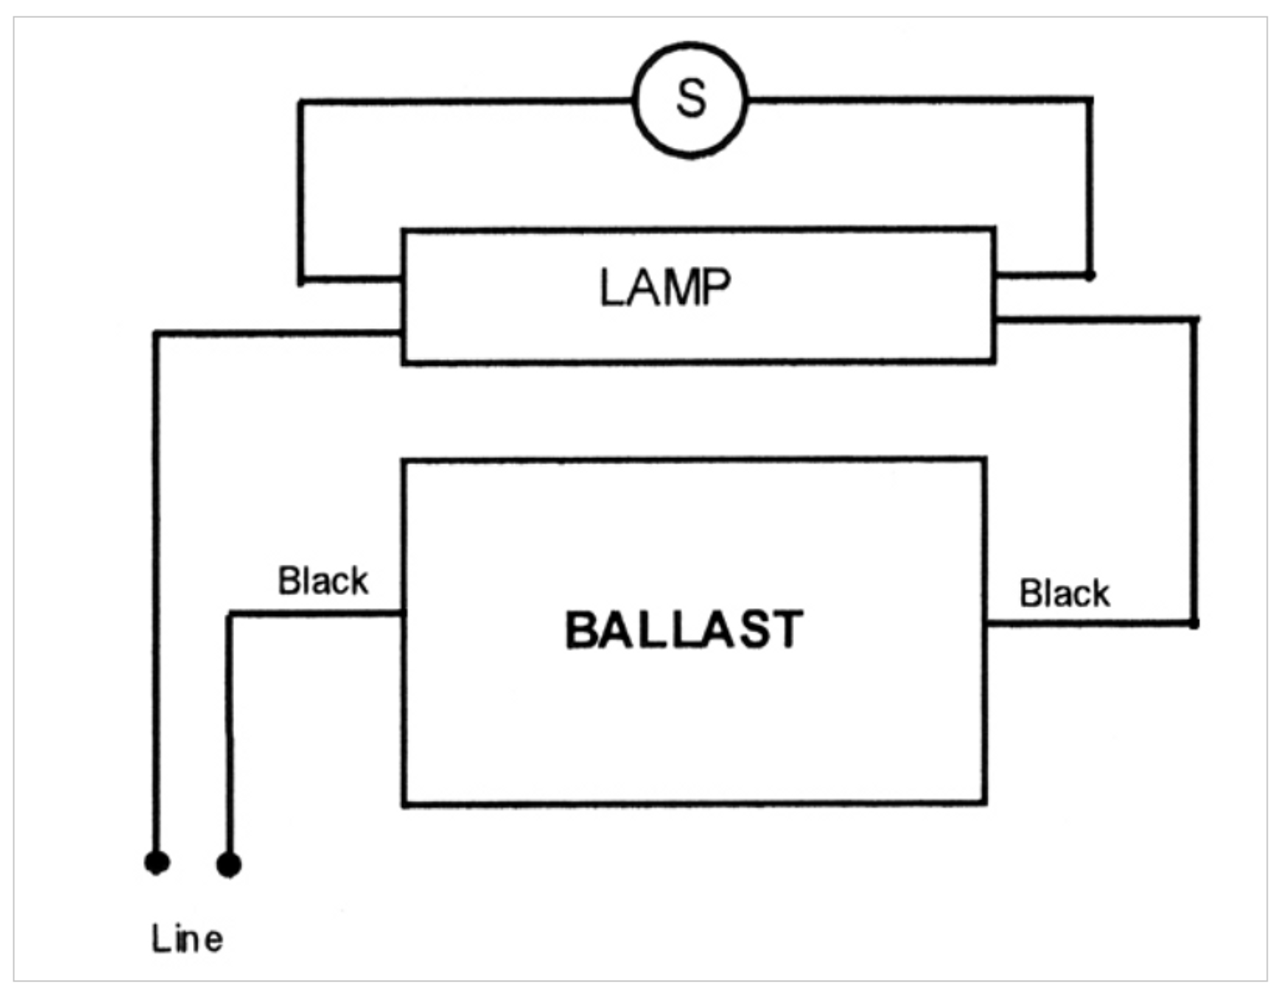 robertson ballast wiring diagram wiring diagrams lolsp48 robertson magnetic ballast f4t5 f6t5 f8t5 lamps [ 1280 x 998 Pixel ]